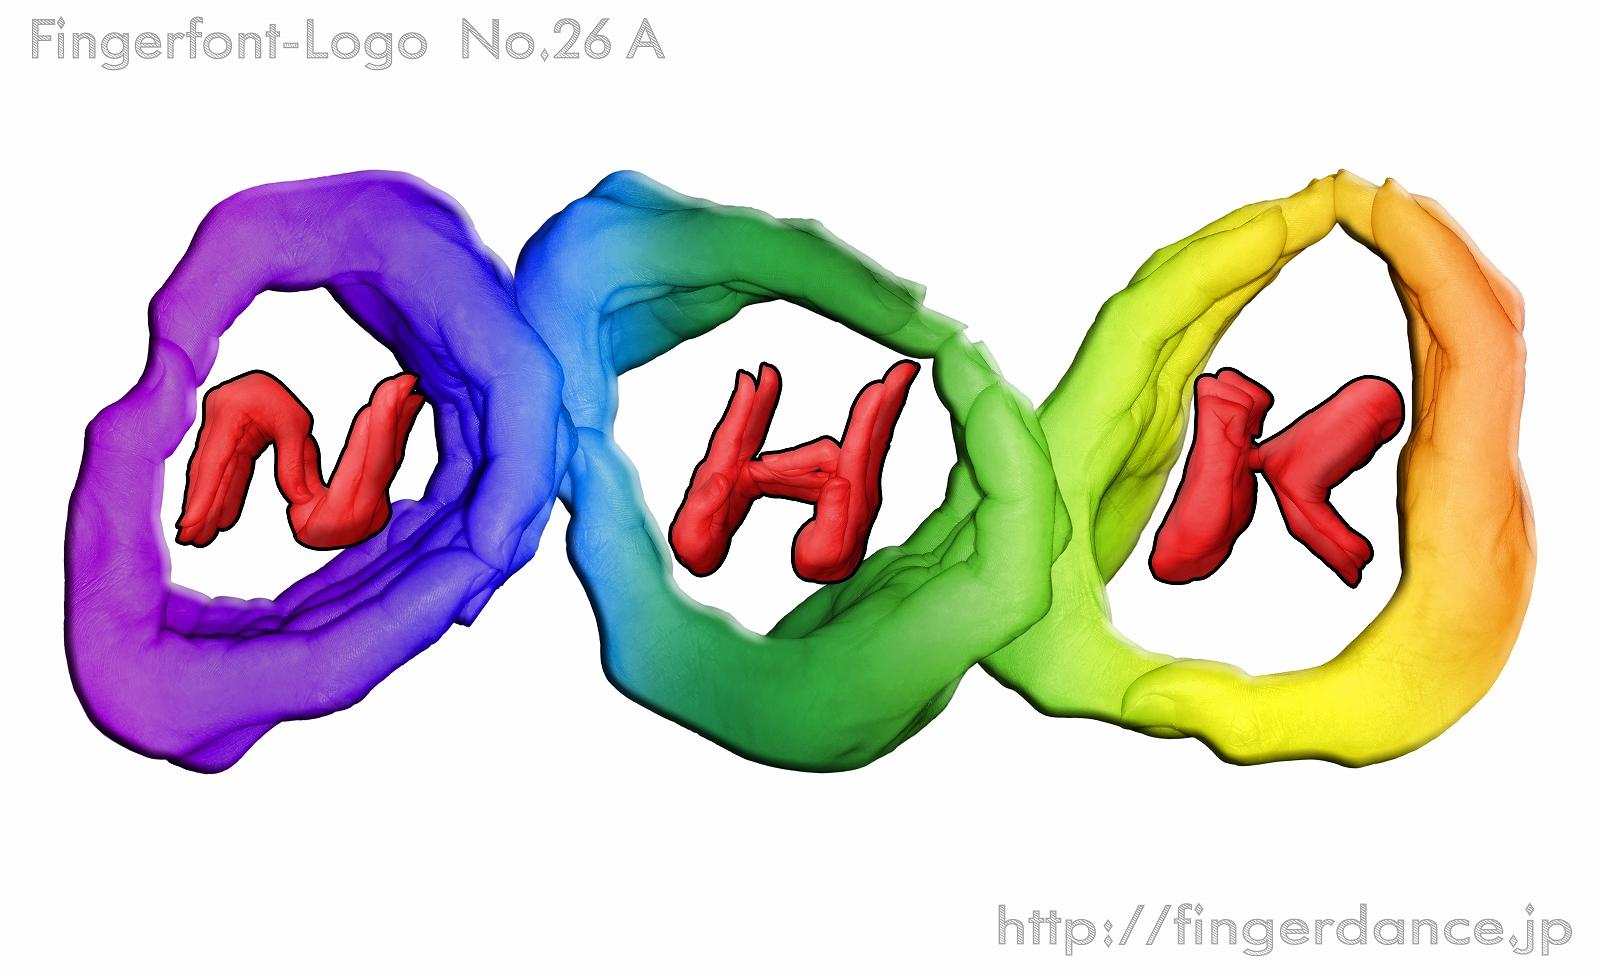 NHK-fingerlogohand 日本放送協会フィンガーロゴハンド手指